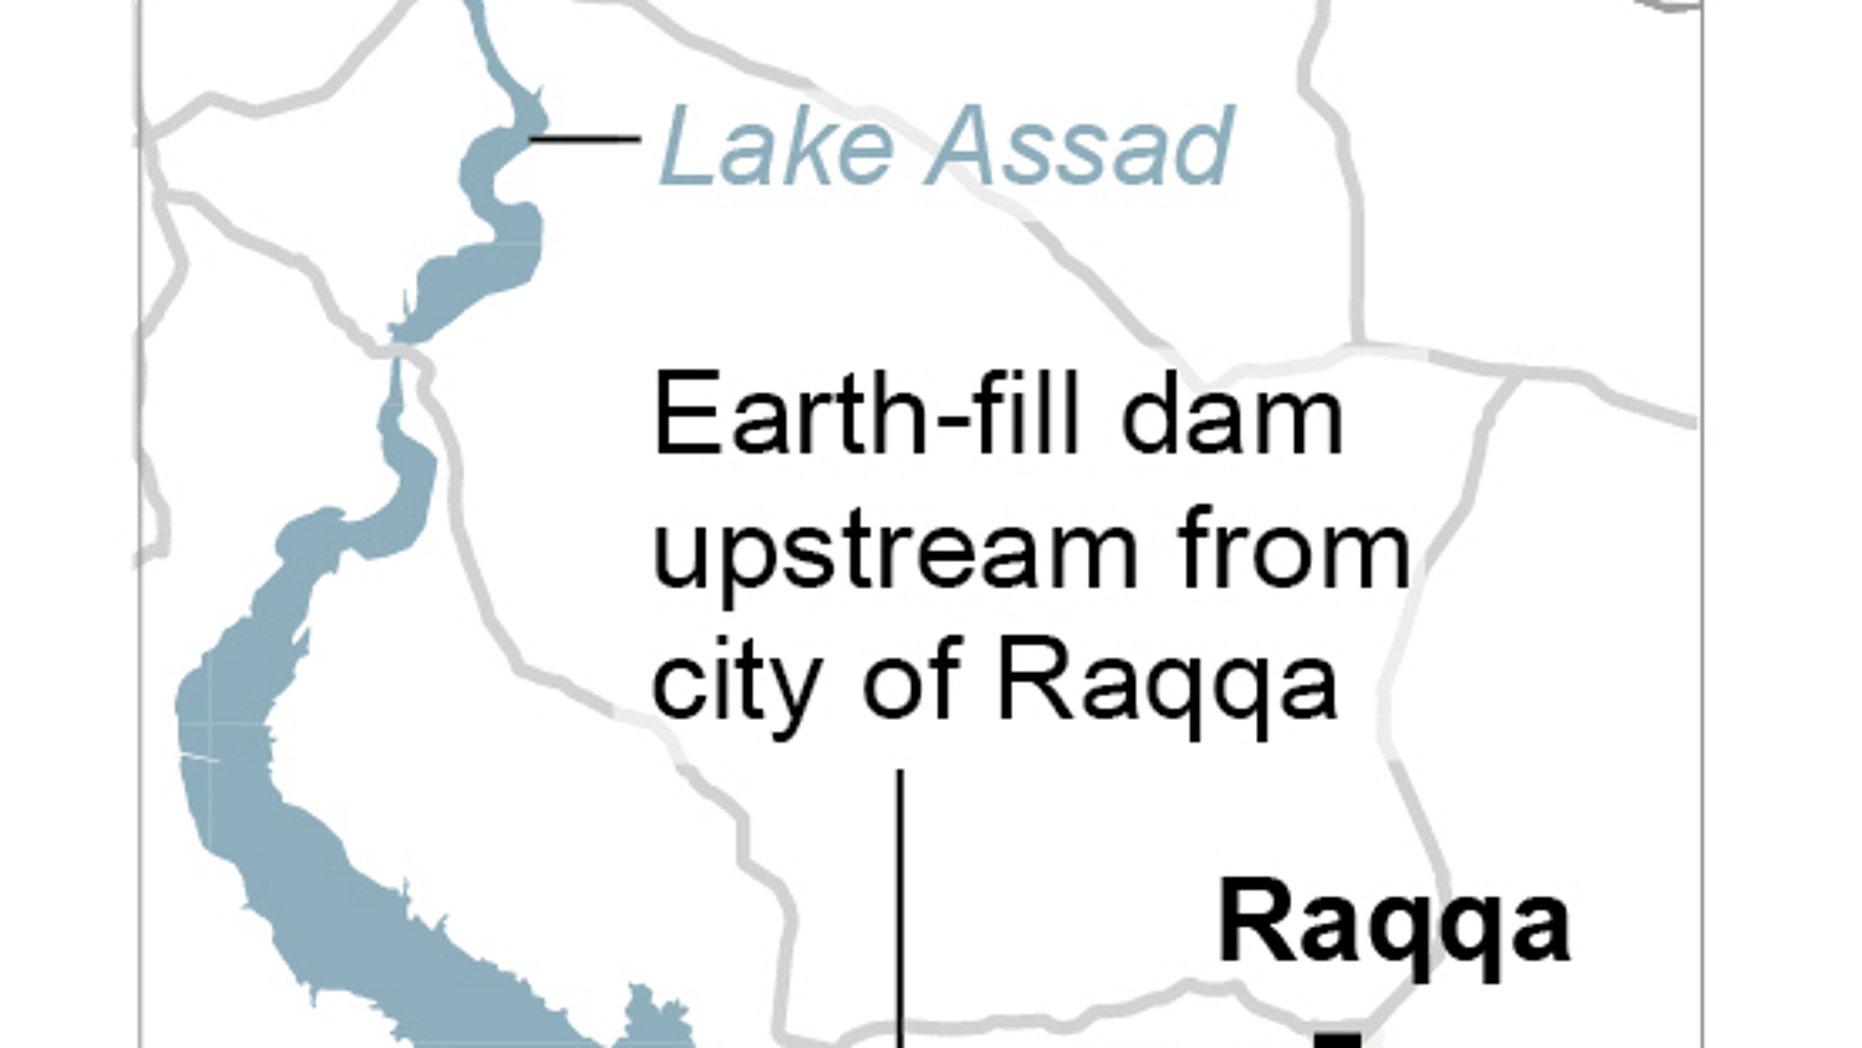 Islamic State warns Syrian dam at risk, evacuates residents